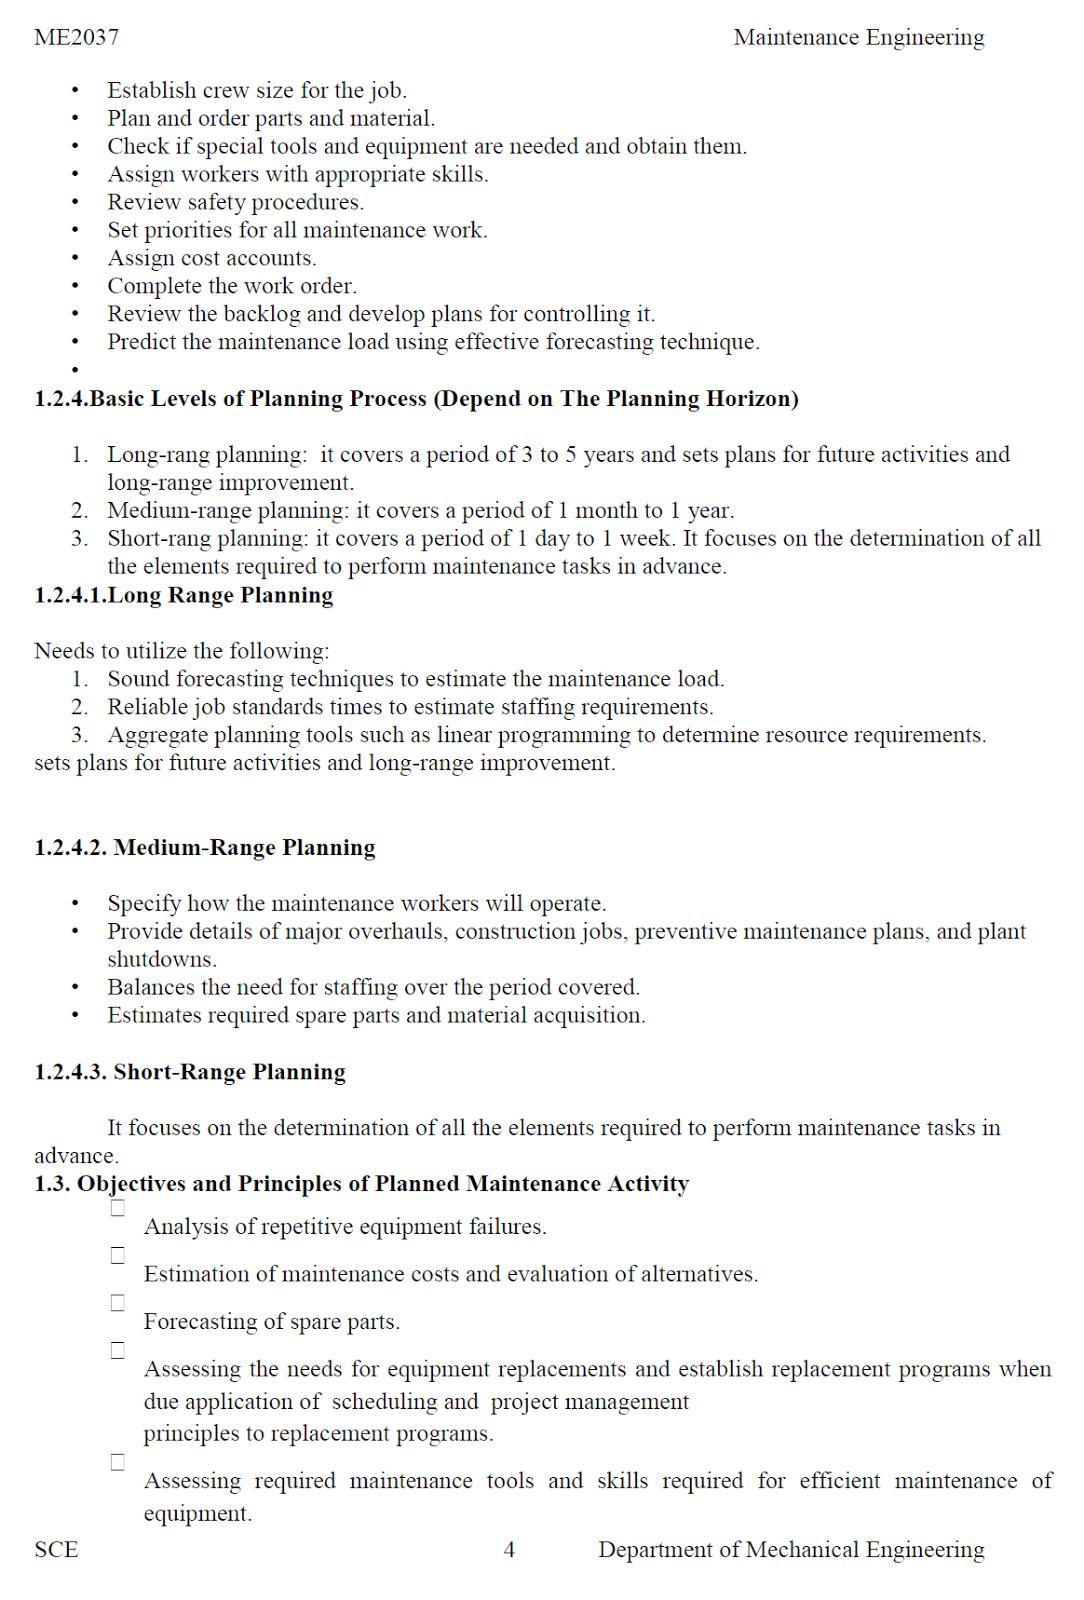 ME6012 Maintenance Engineering Notes PDF - University